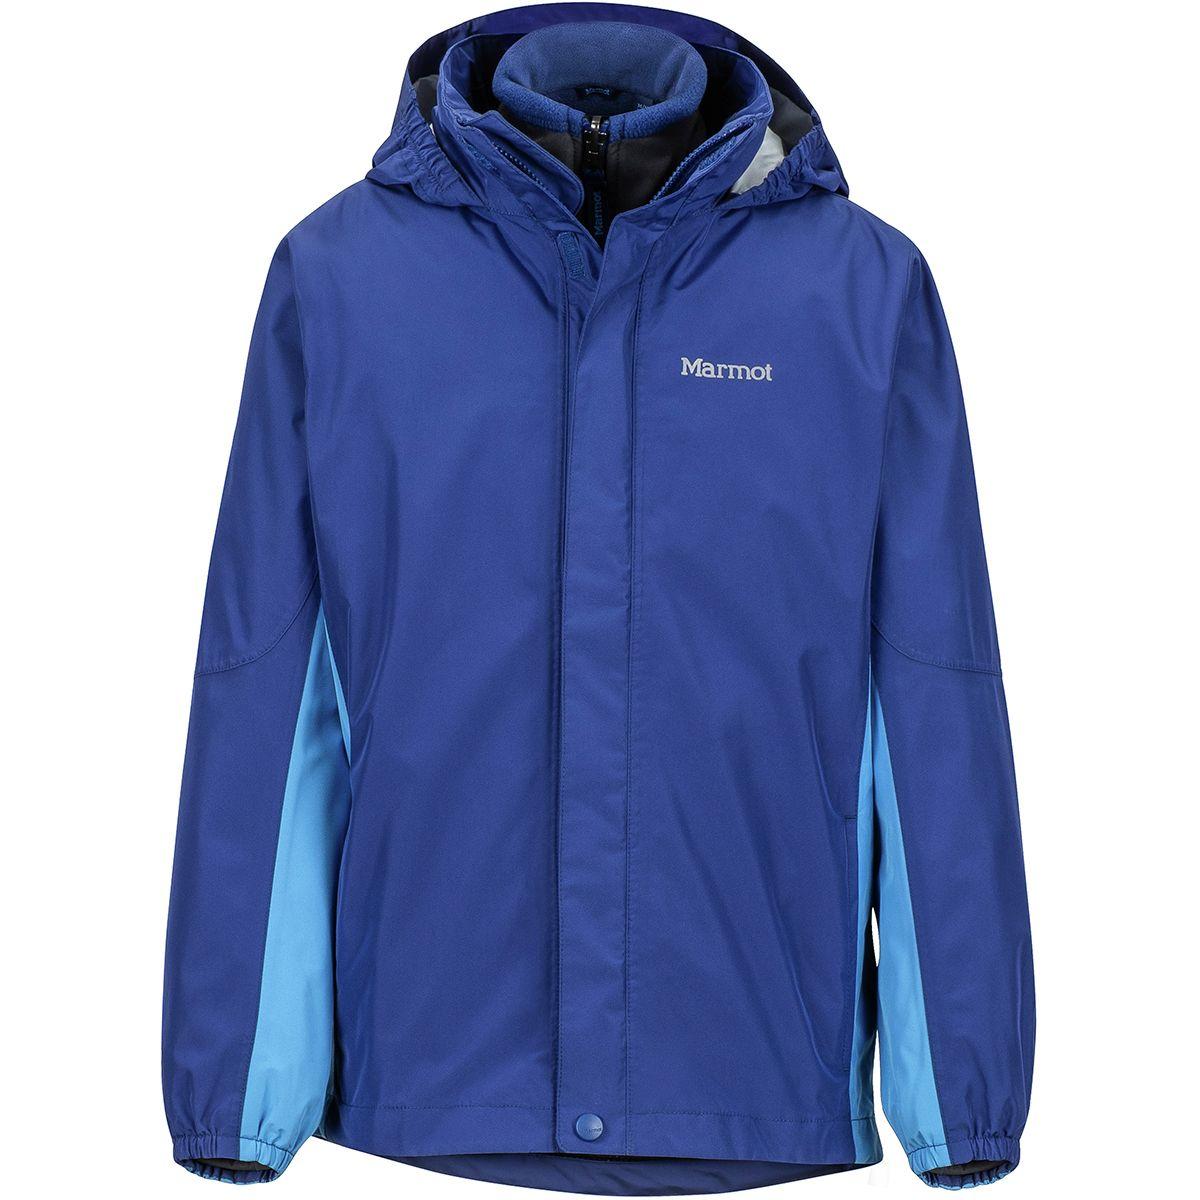 photo: Marmot Boys' Northshore Jacket component (3-in-1) jacket